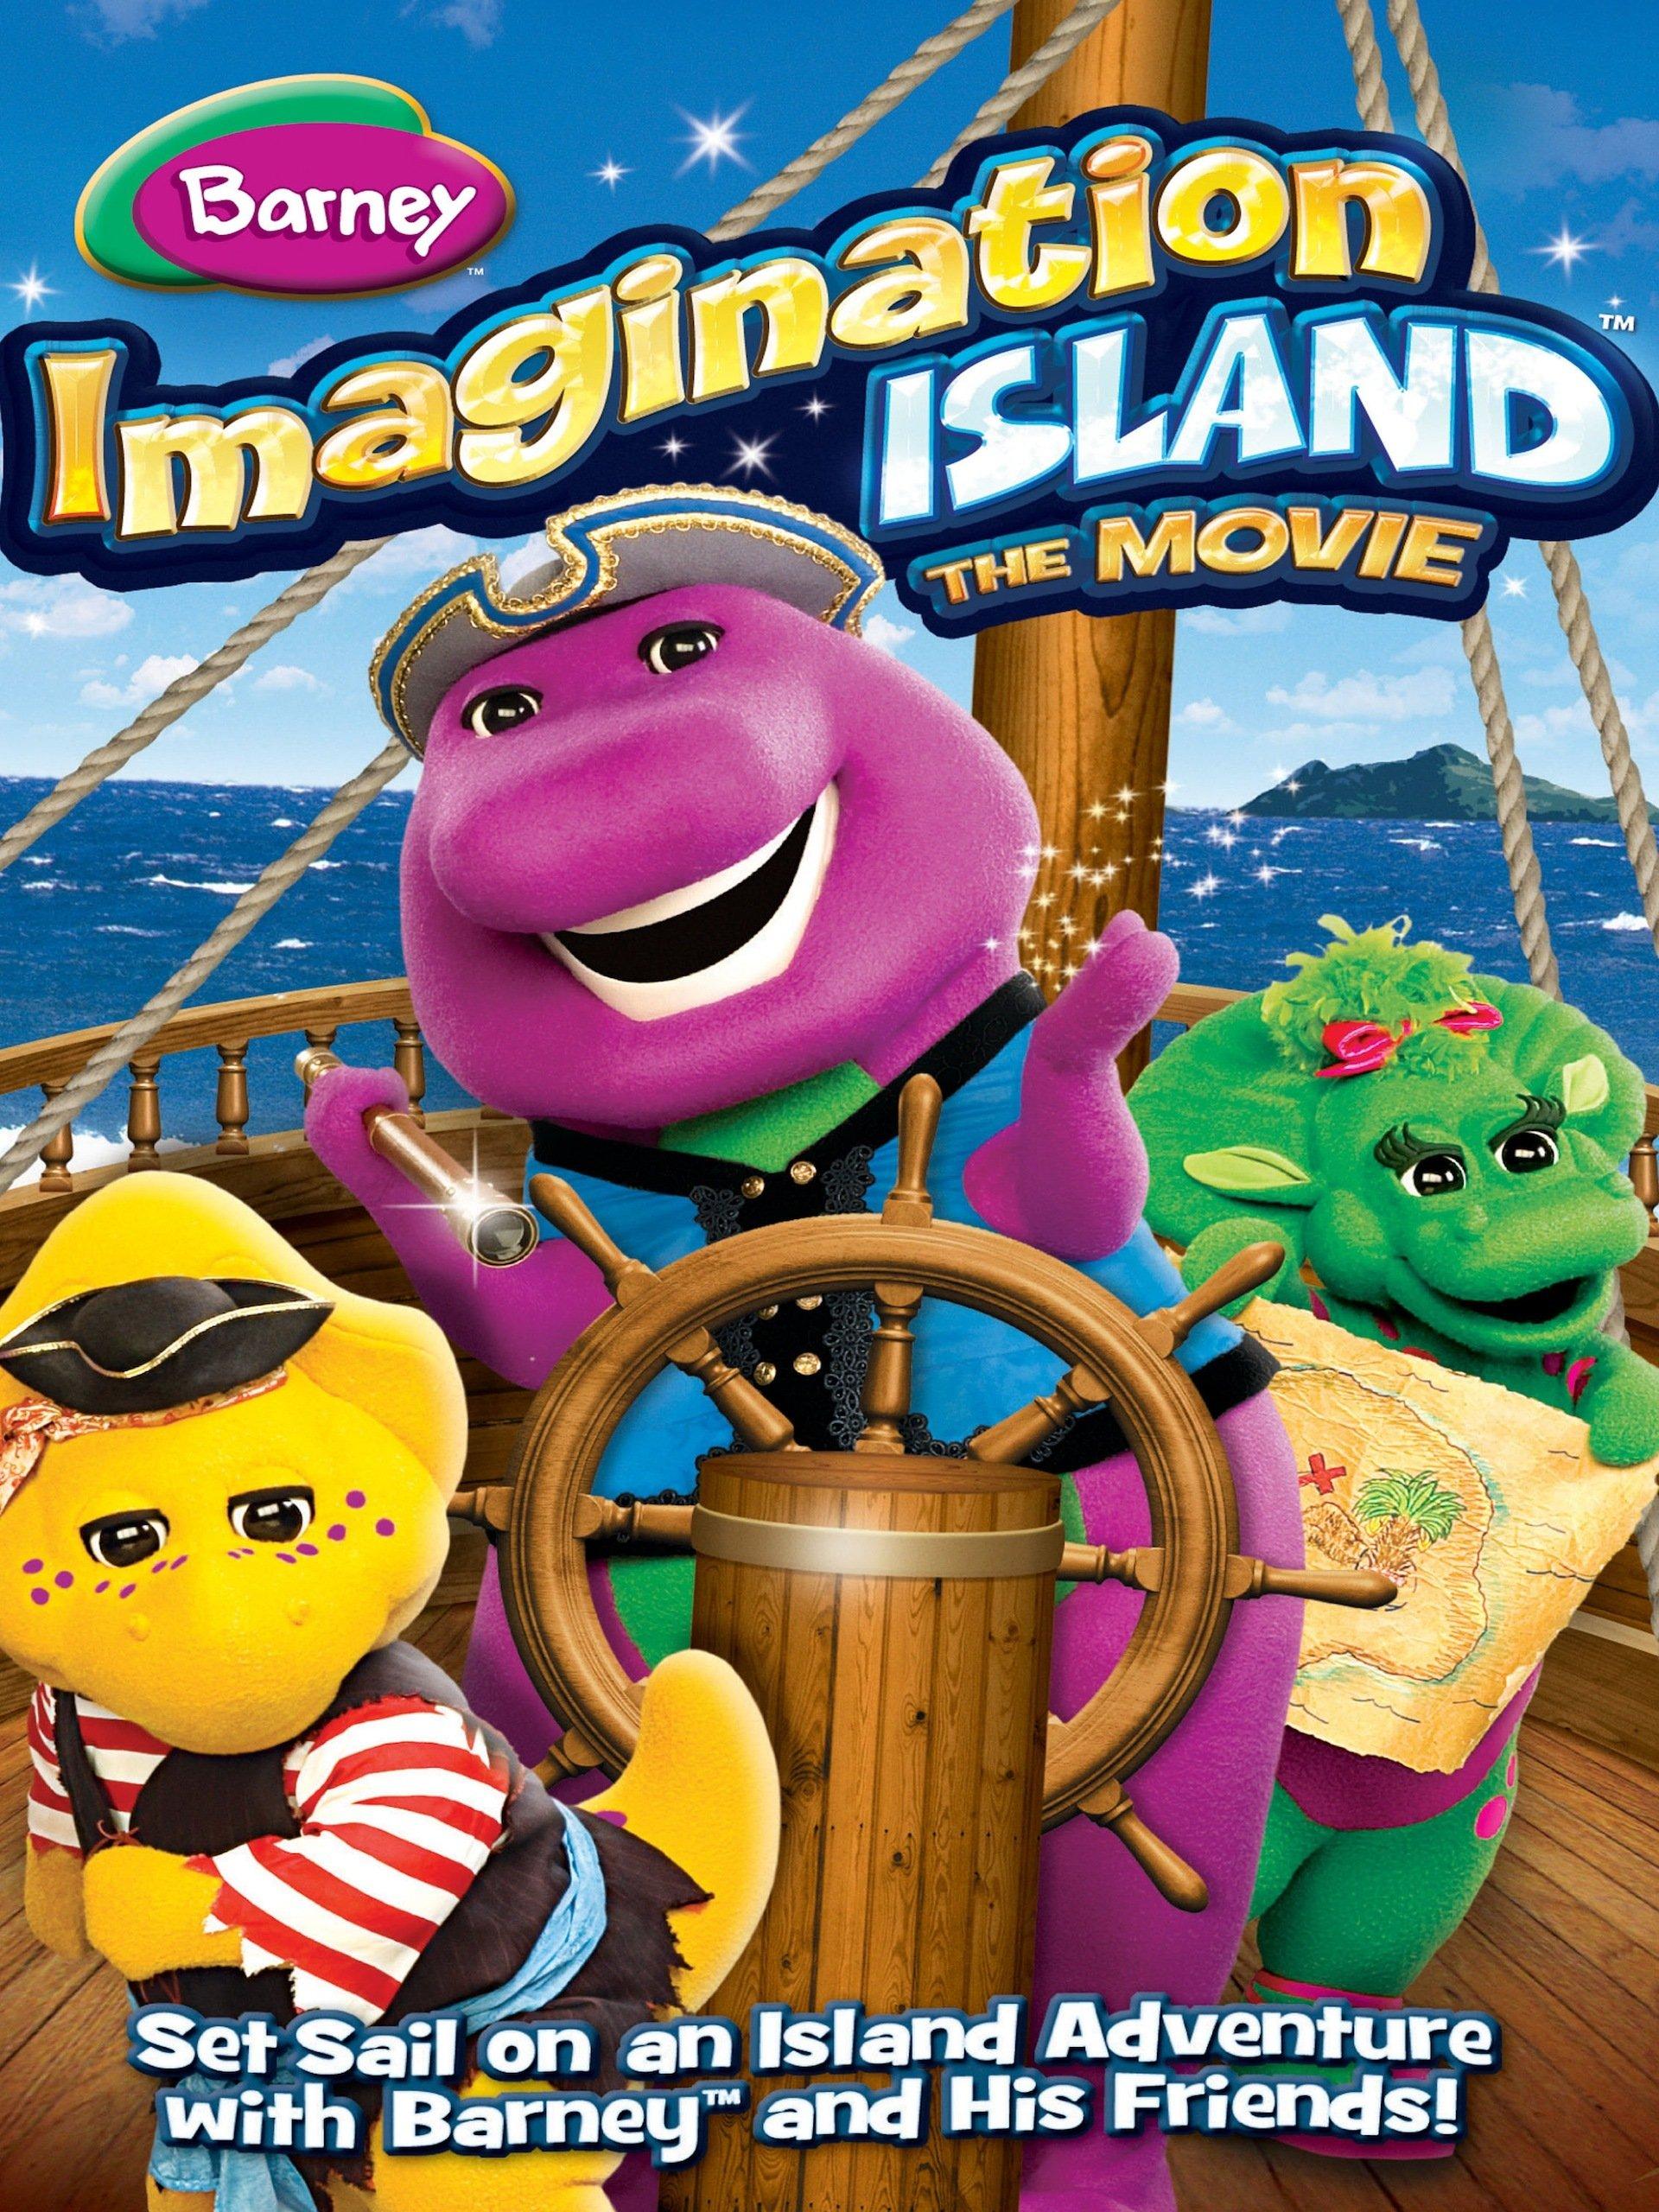 Amazon.com: Barney: Imagination Island The Movie: Barry Pearl, John ...